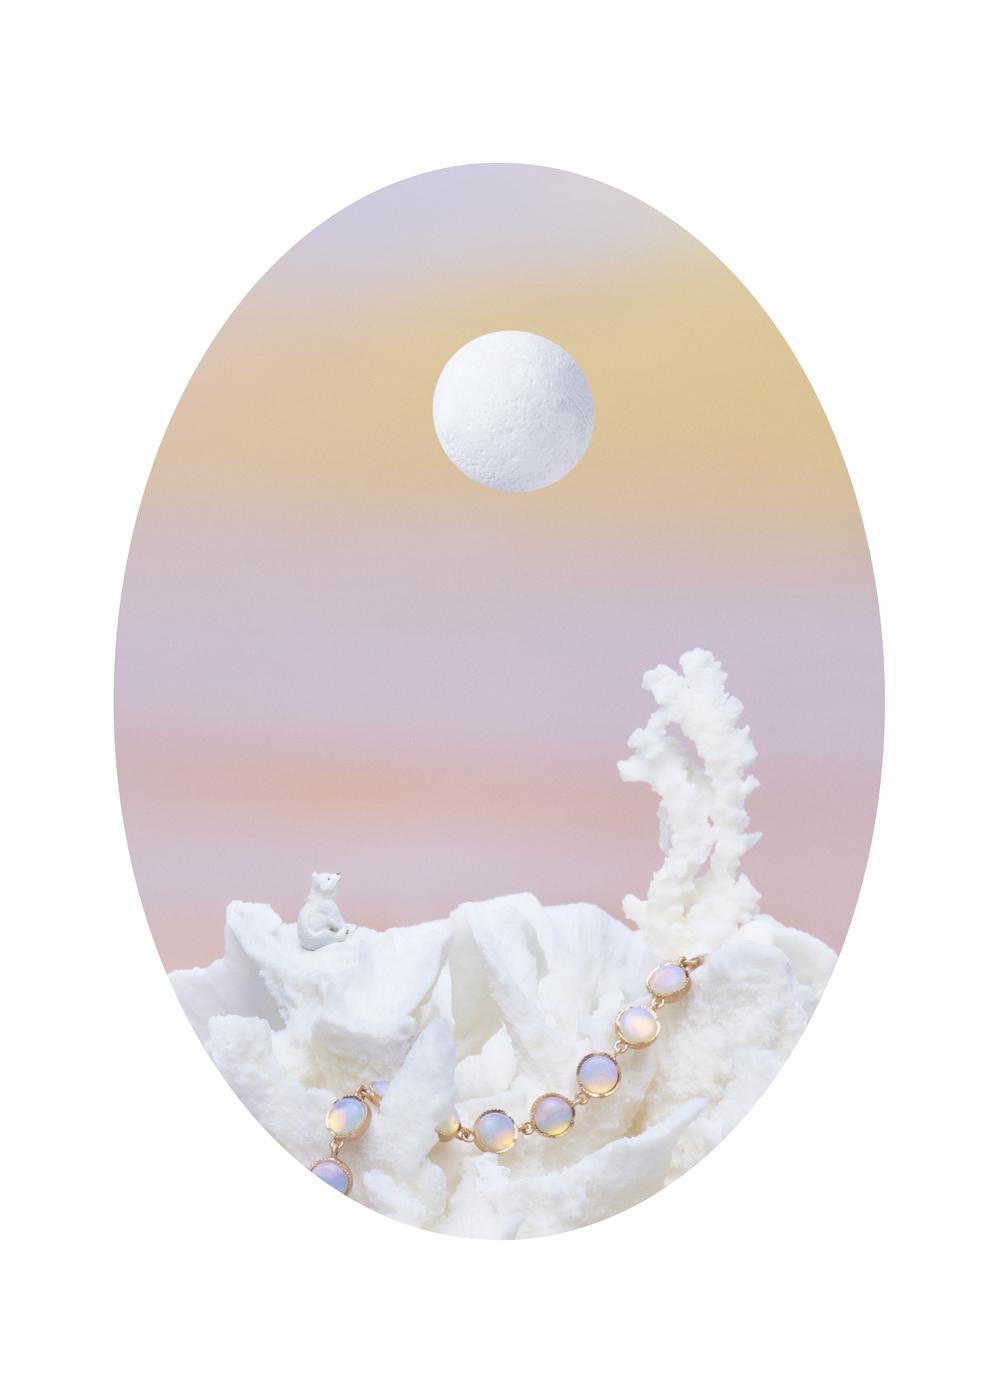 Irene Neuwirth Jewelry Holiday Card